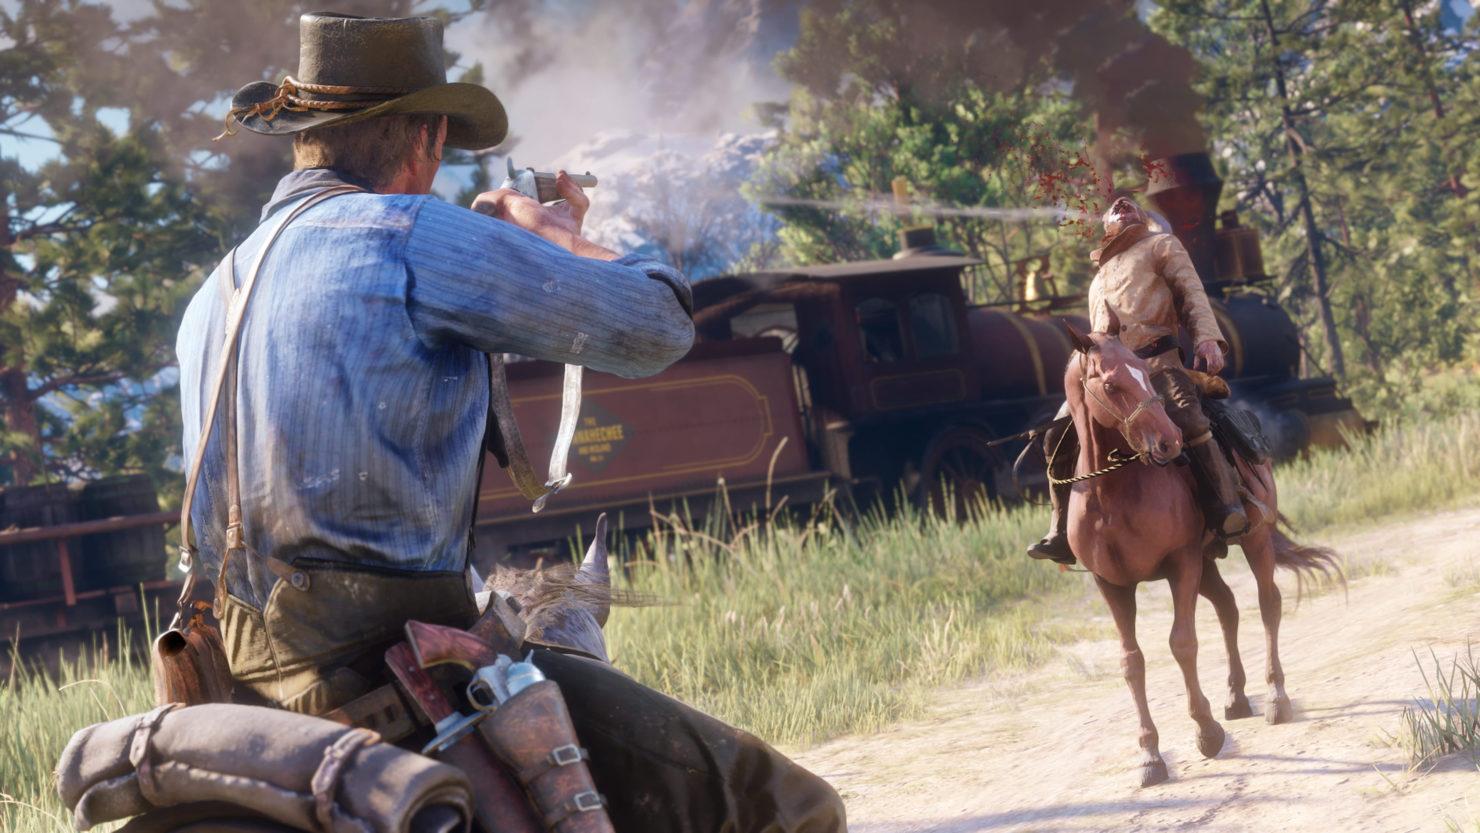 Red Dead Redemption 2's Guns Detailed. New Screenshots Showcase Dead-Eye